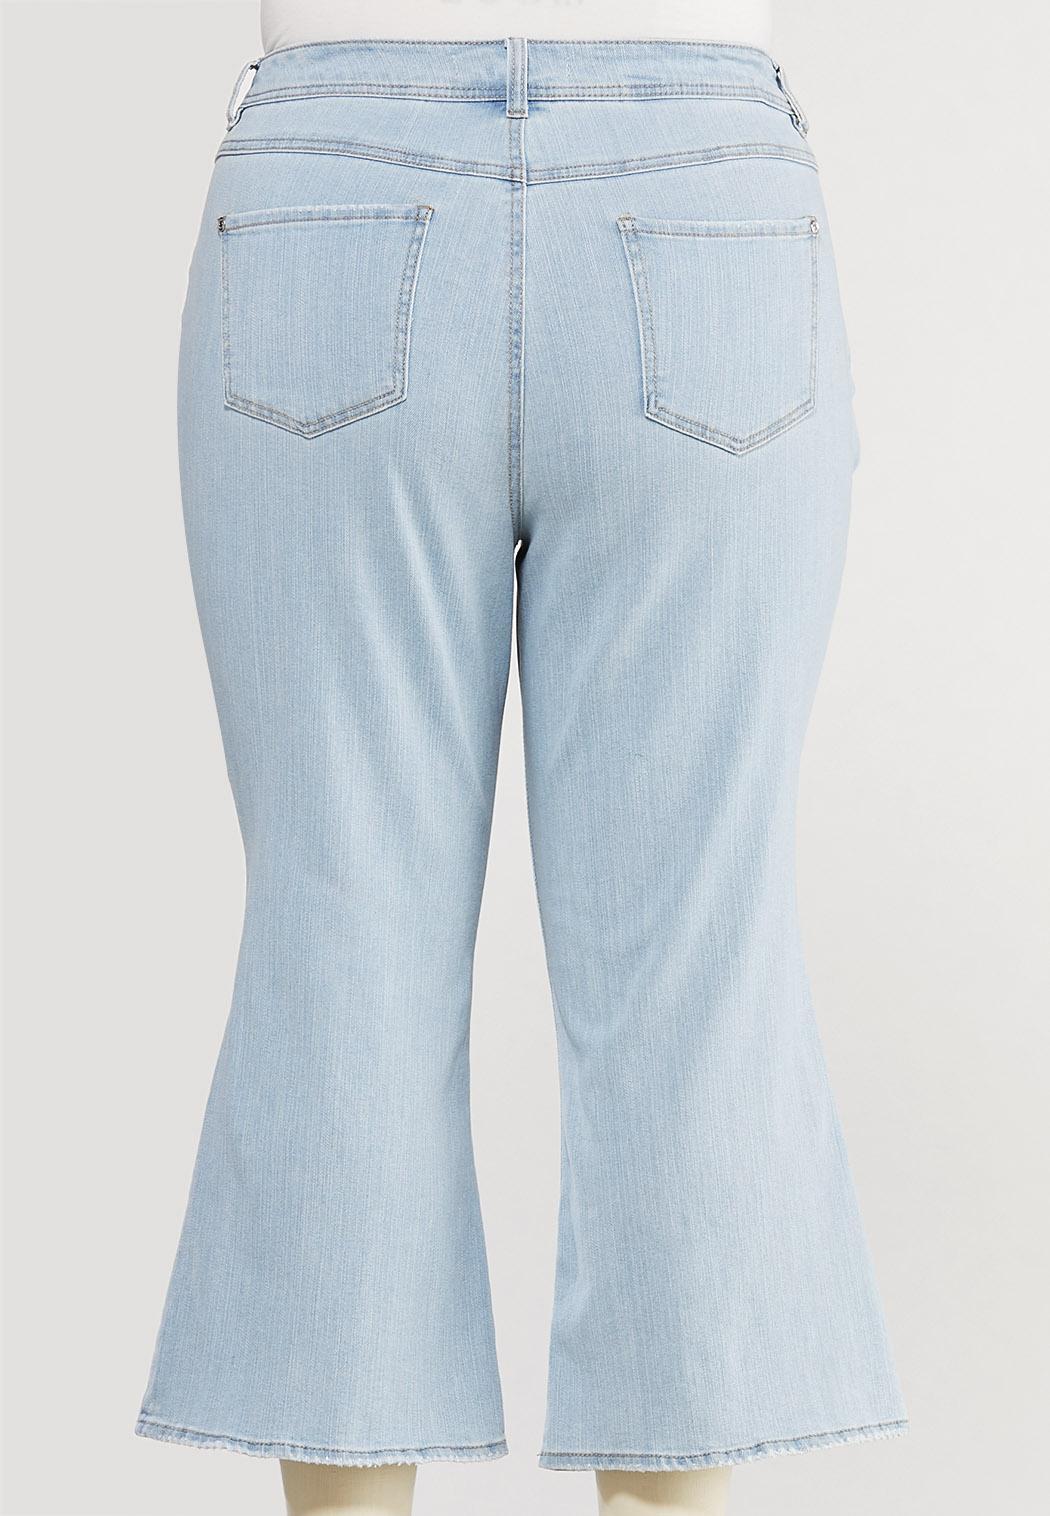 Plus Size Cropped Lightwash Flare Jeans (Item #44522517)